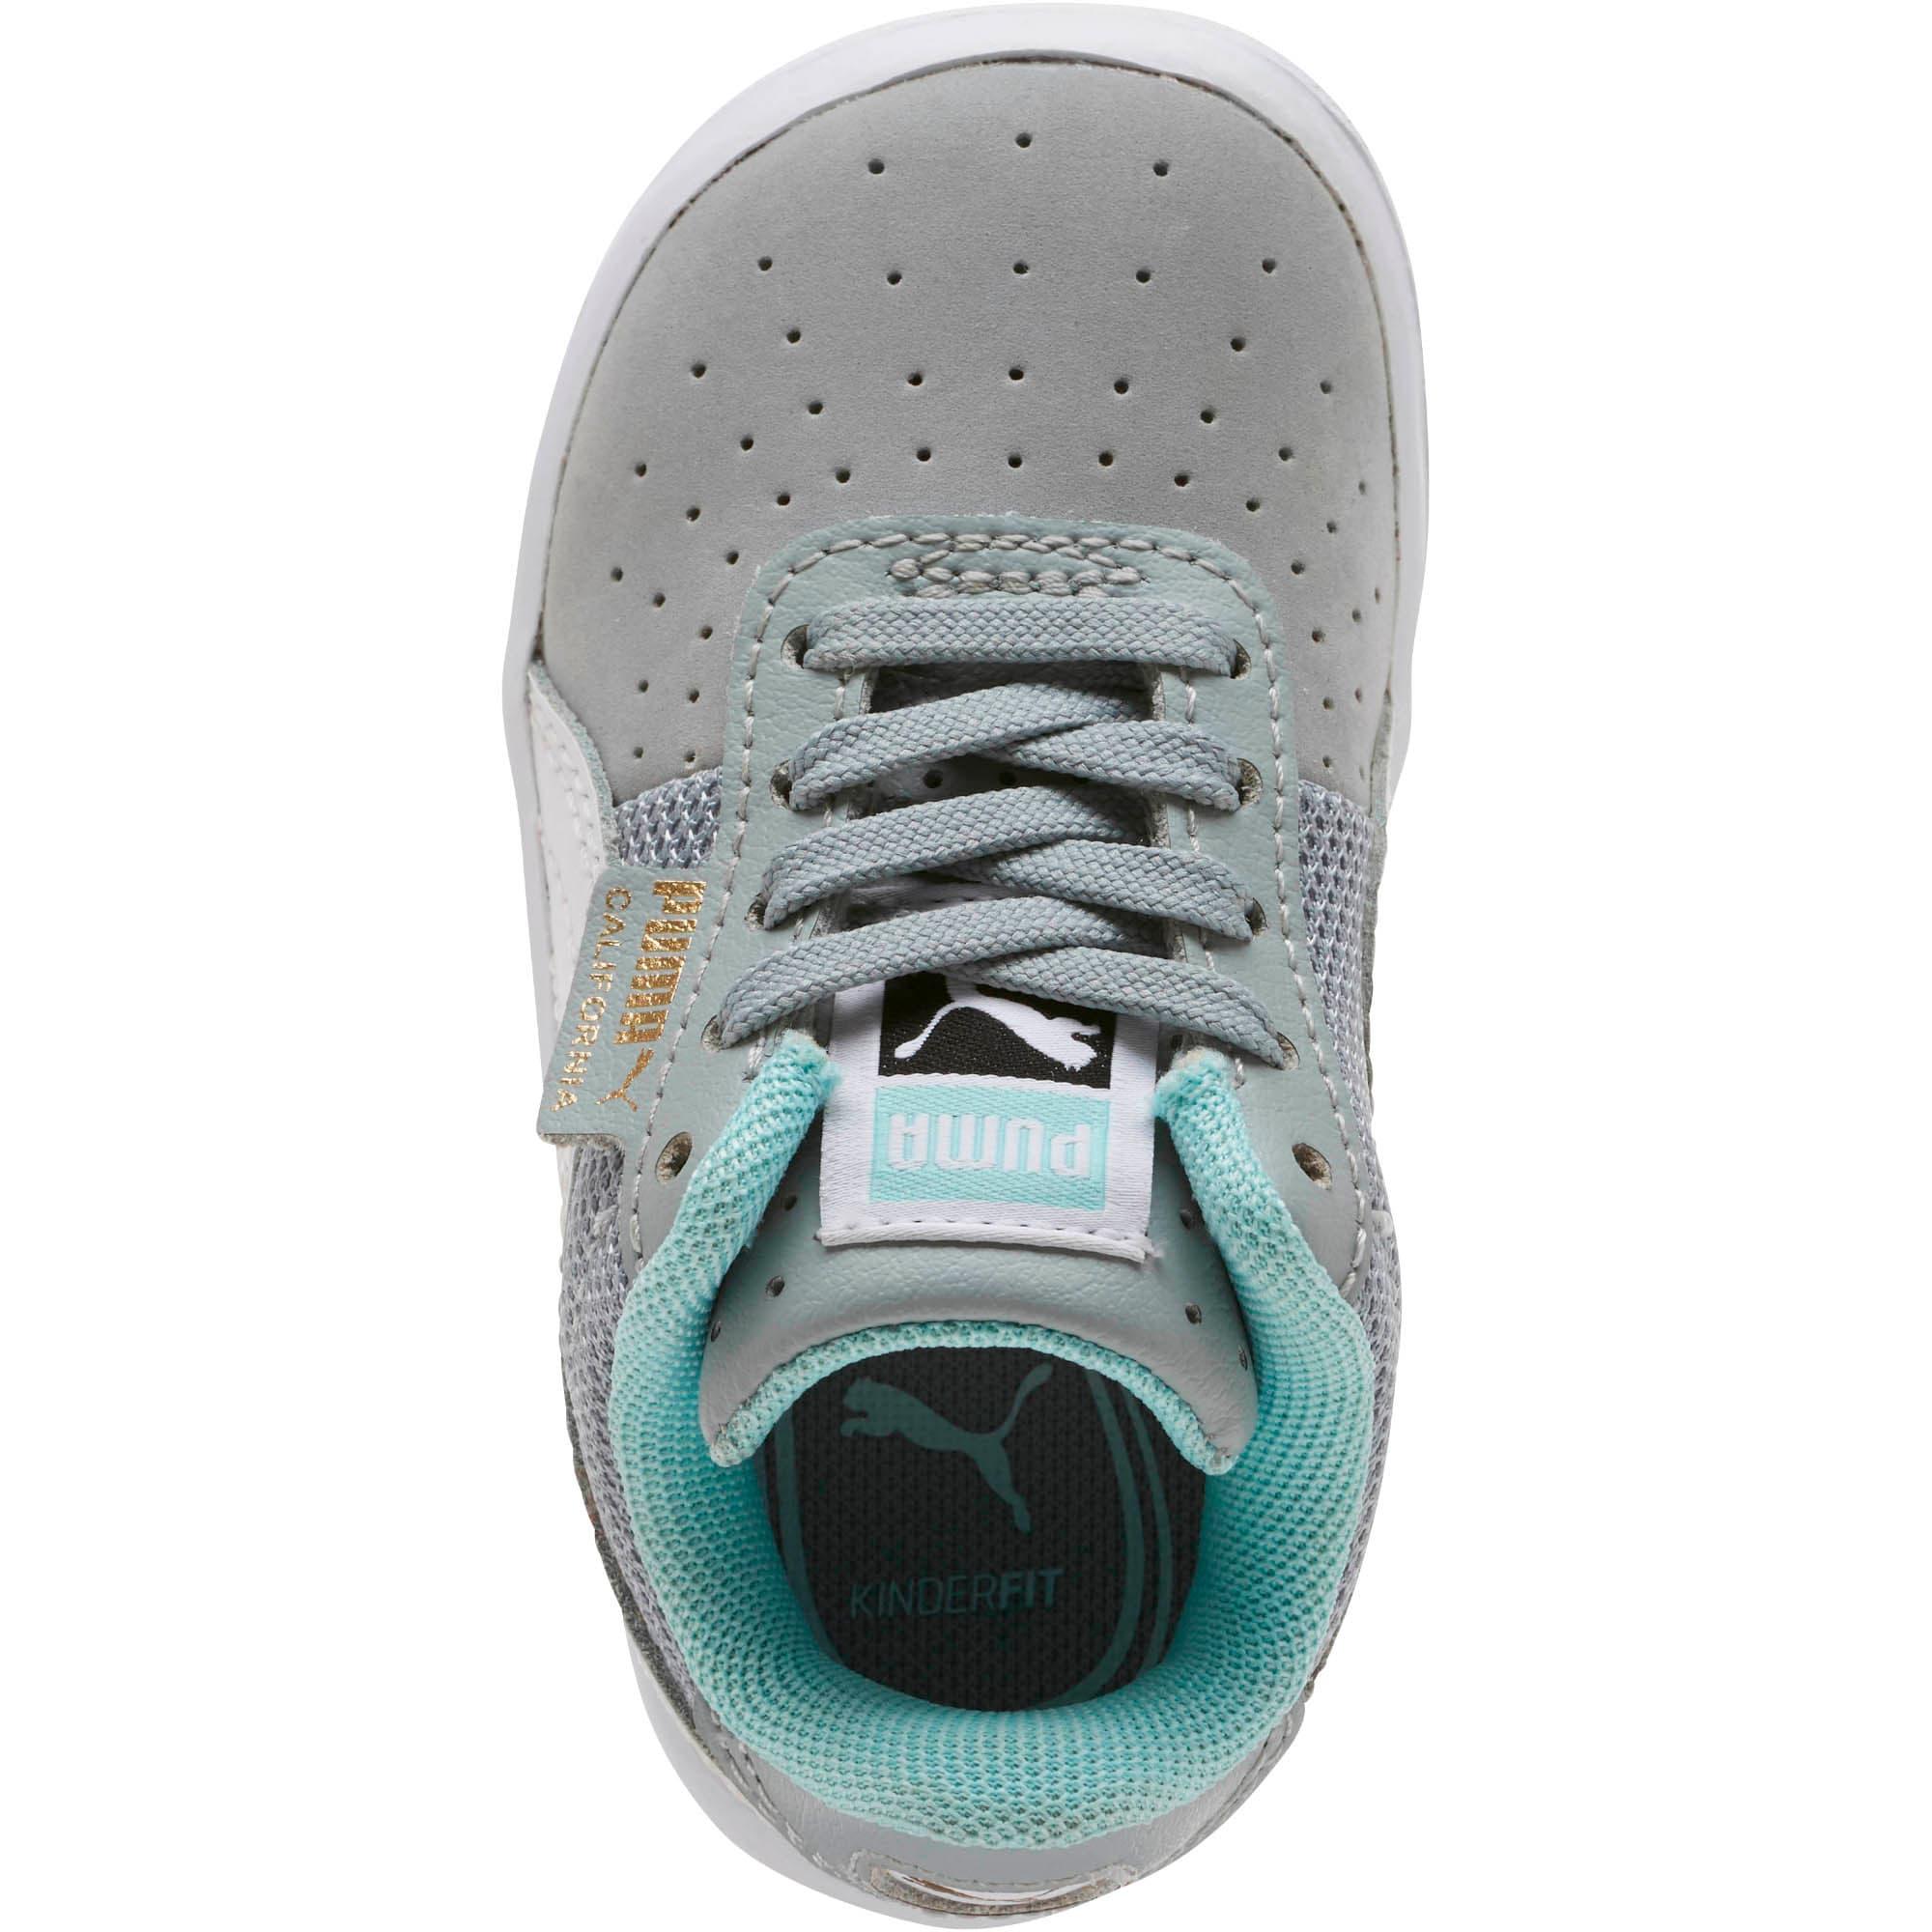 Thumbnail 5 of California Casual Toddler Shoes, Quarry-Puma White-Gold, medium